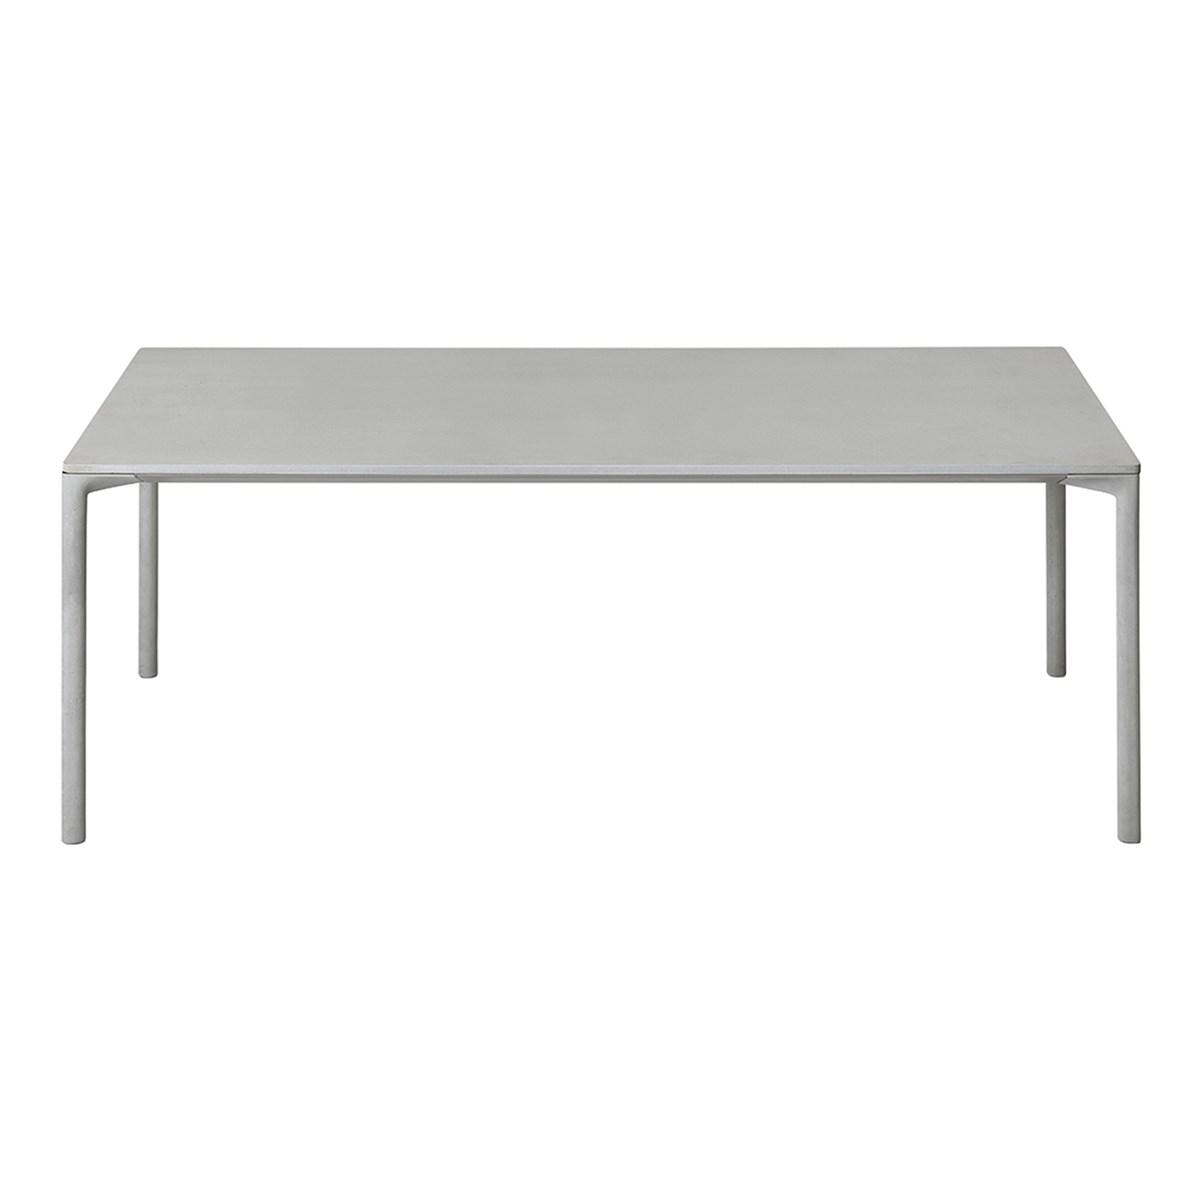 Kristalia-Lucidi-Pevere-Boiacca-Table-Matisse-1